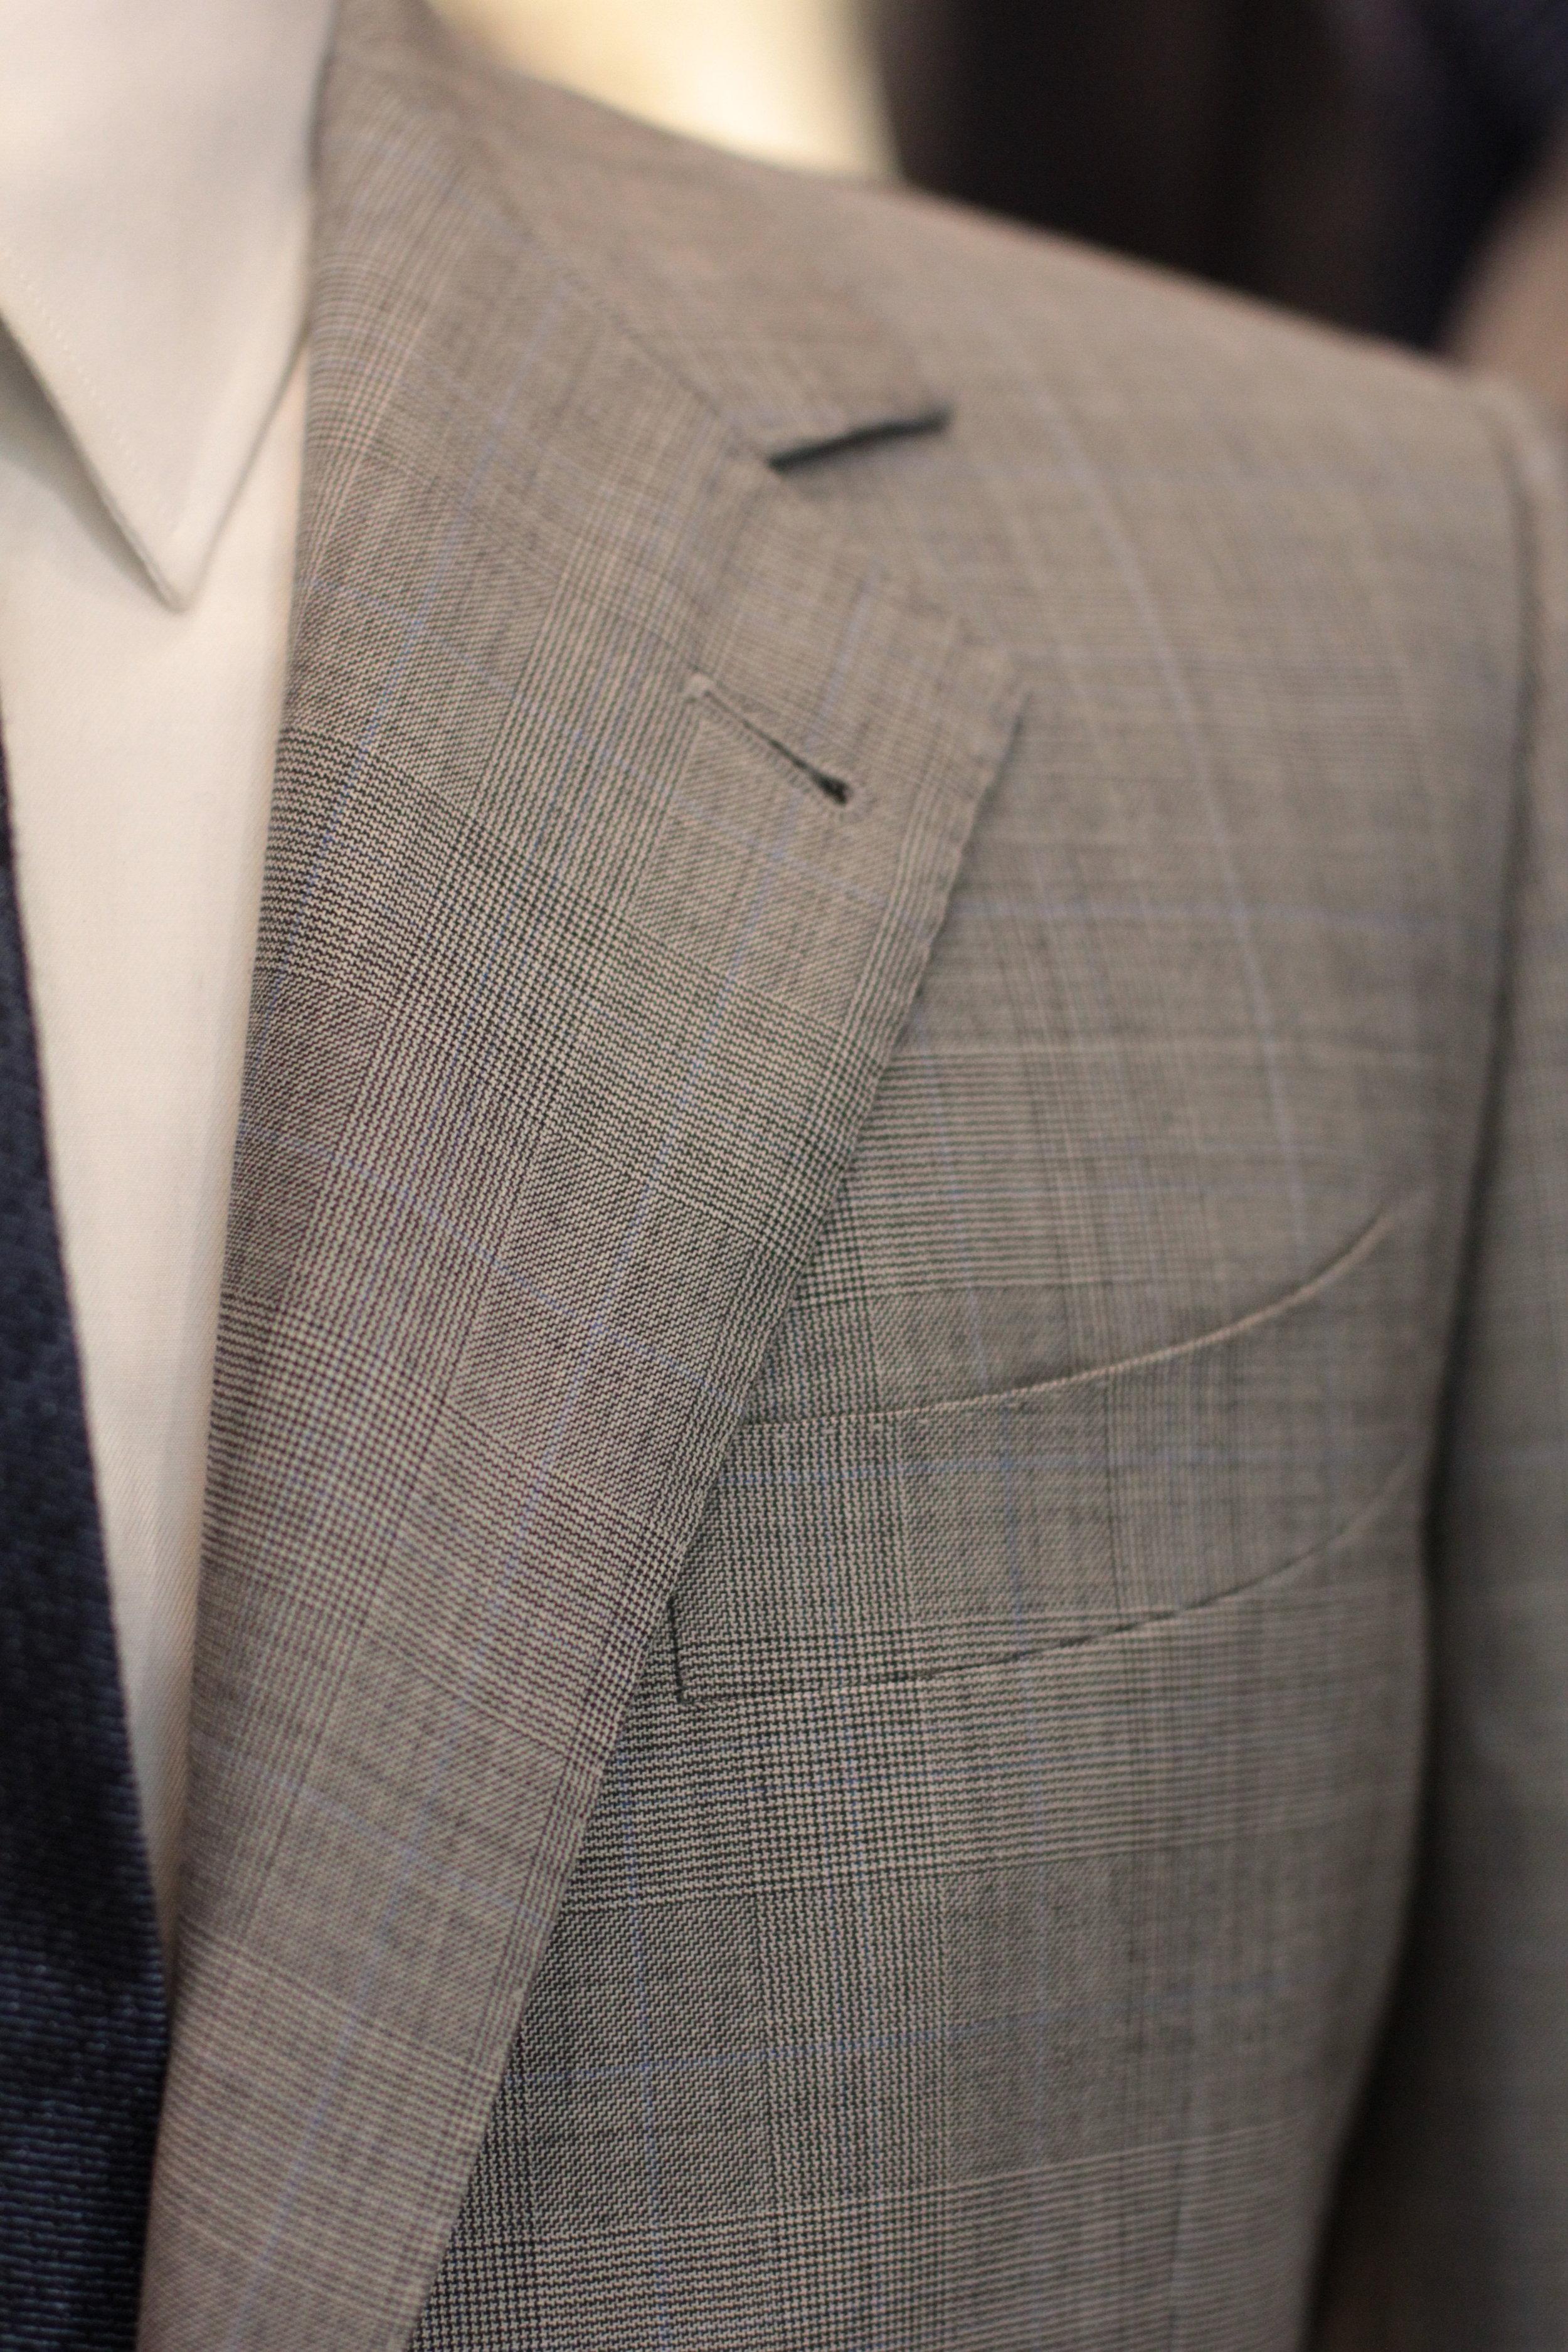 Pic Stitching Details